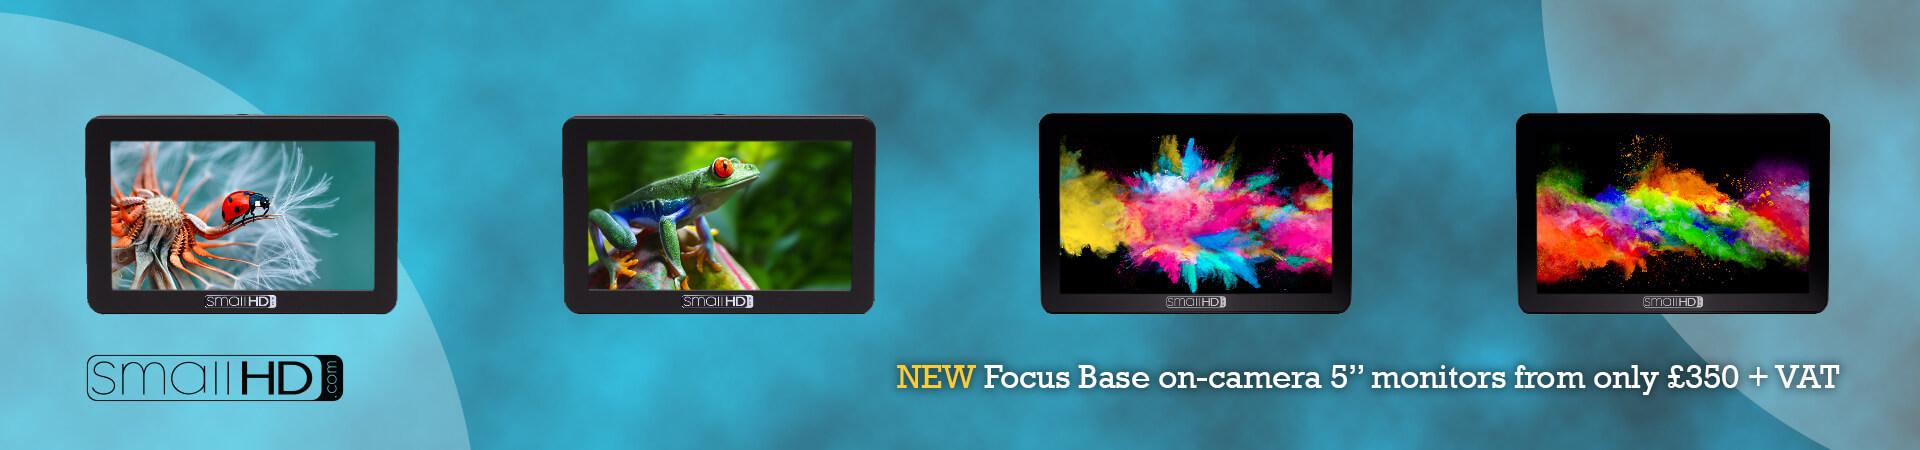 SmallHD Focus Base Models